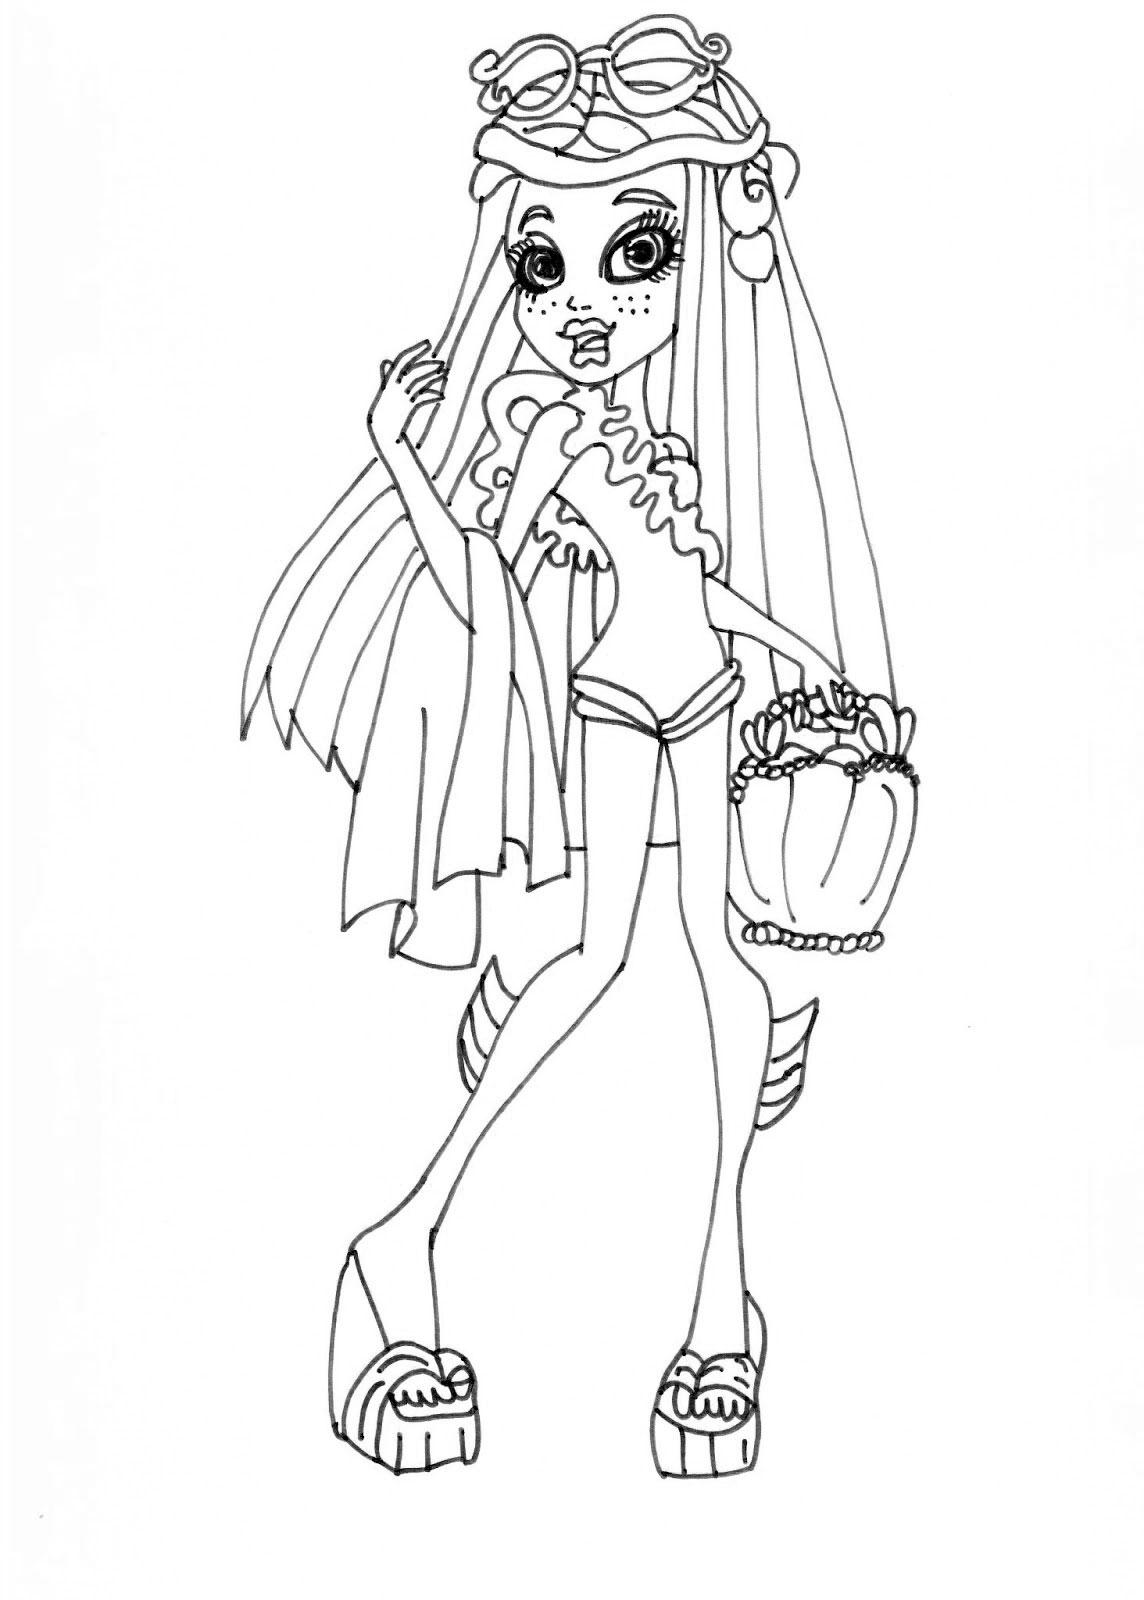 154 dibujos de Monster high para colorear | Oh Kids | Page 17